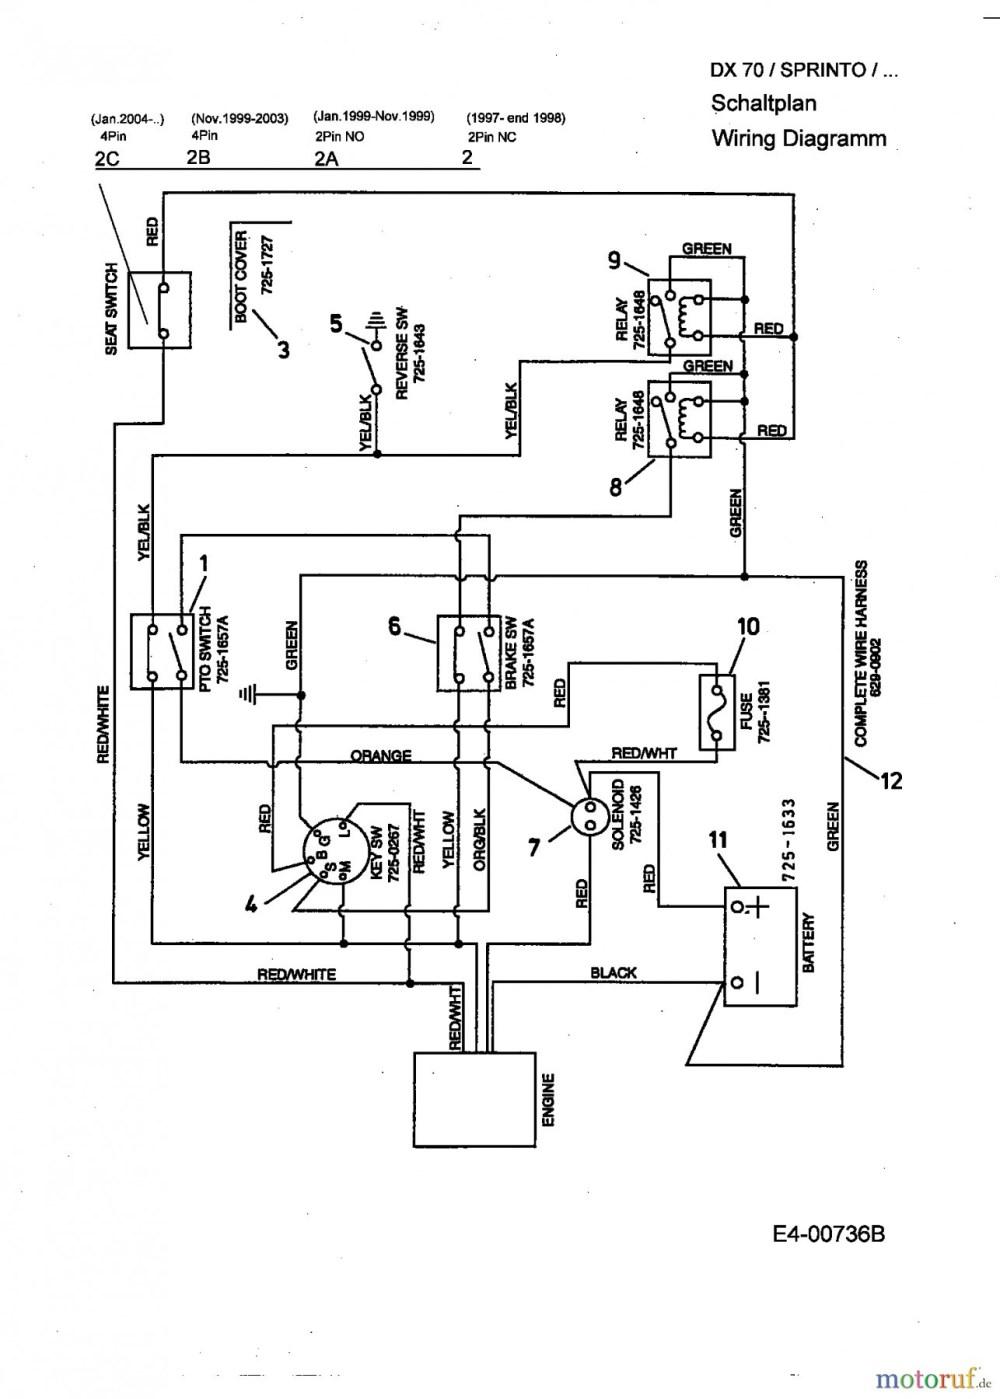 medium resolution of mtd 13cd609g063 wiring diagram wiring diagrams data mtd ignition switch wiring diagram source mtd lawn mower